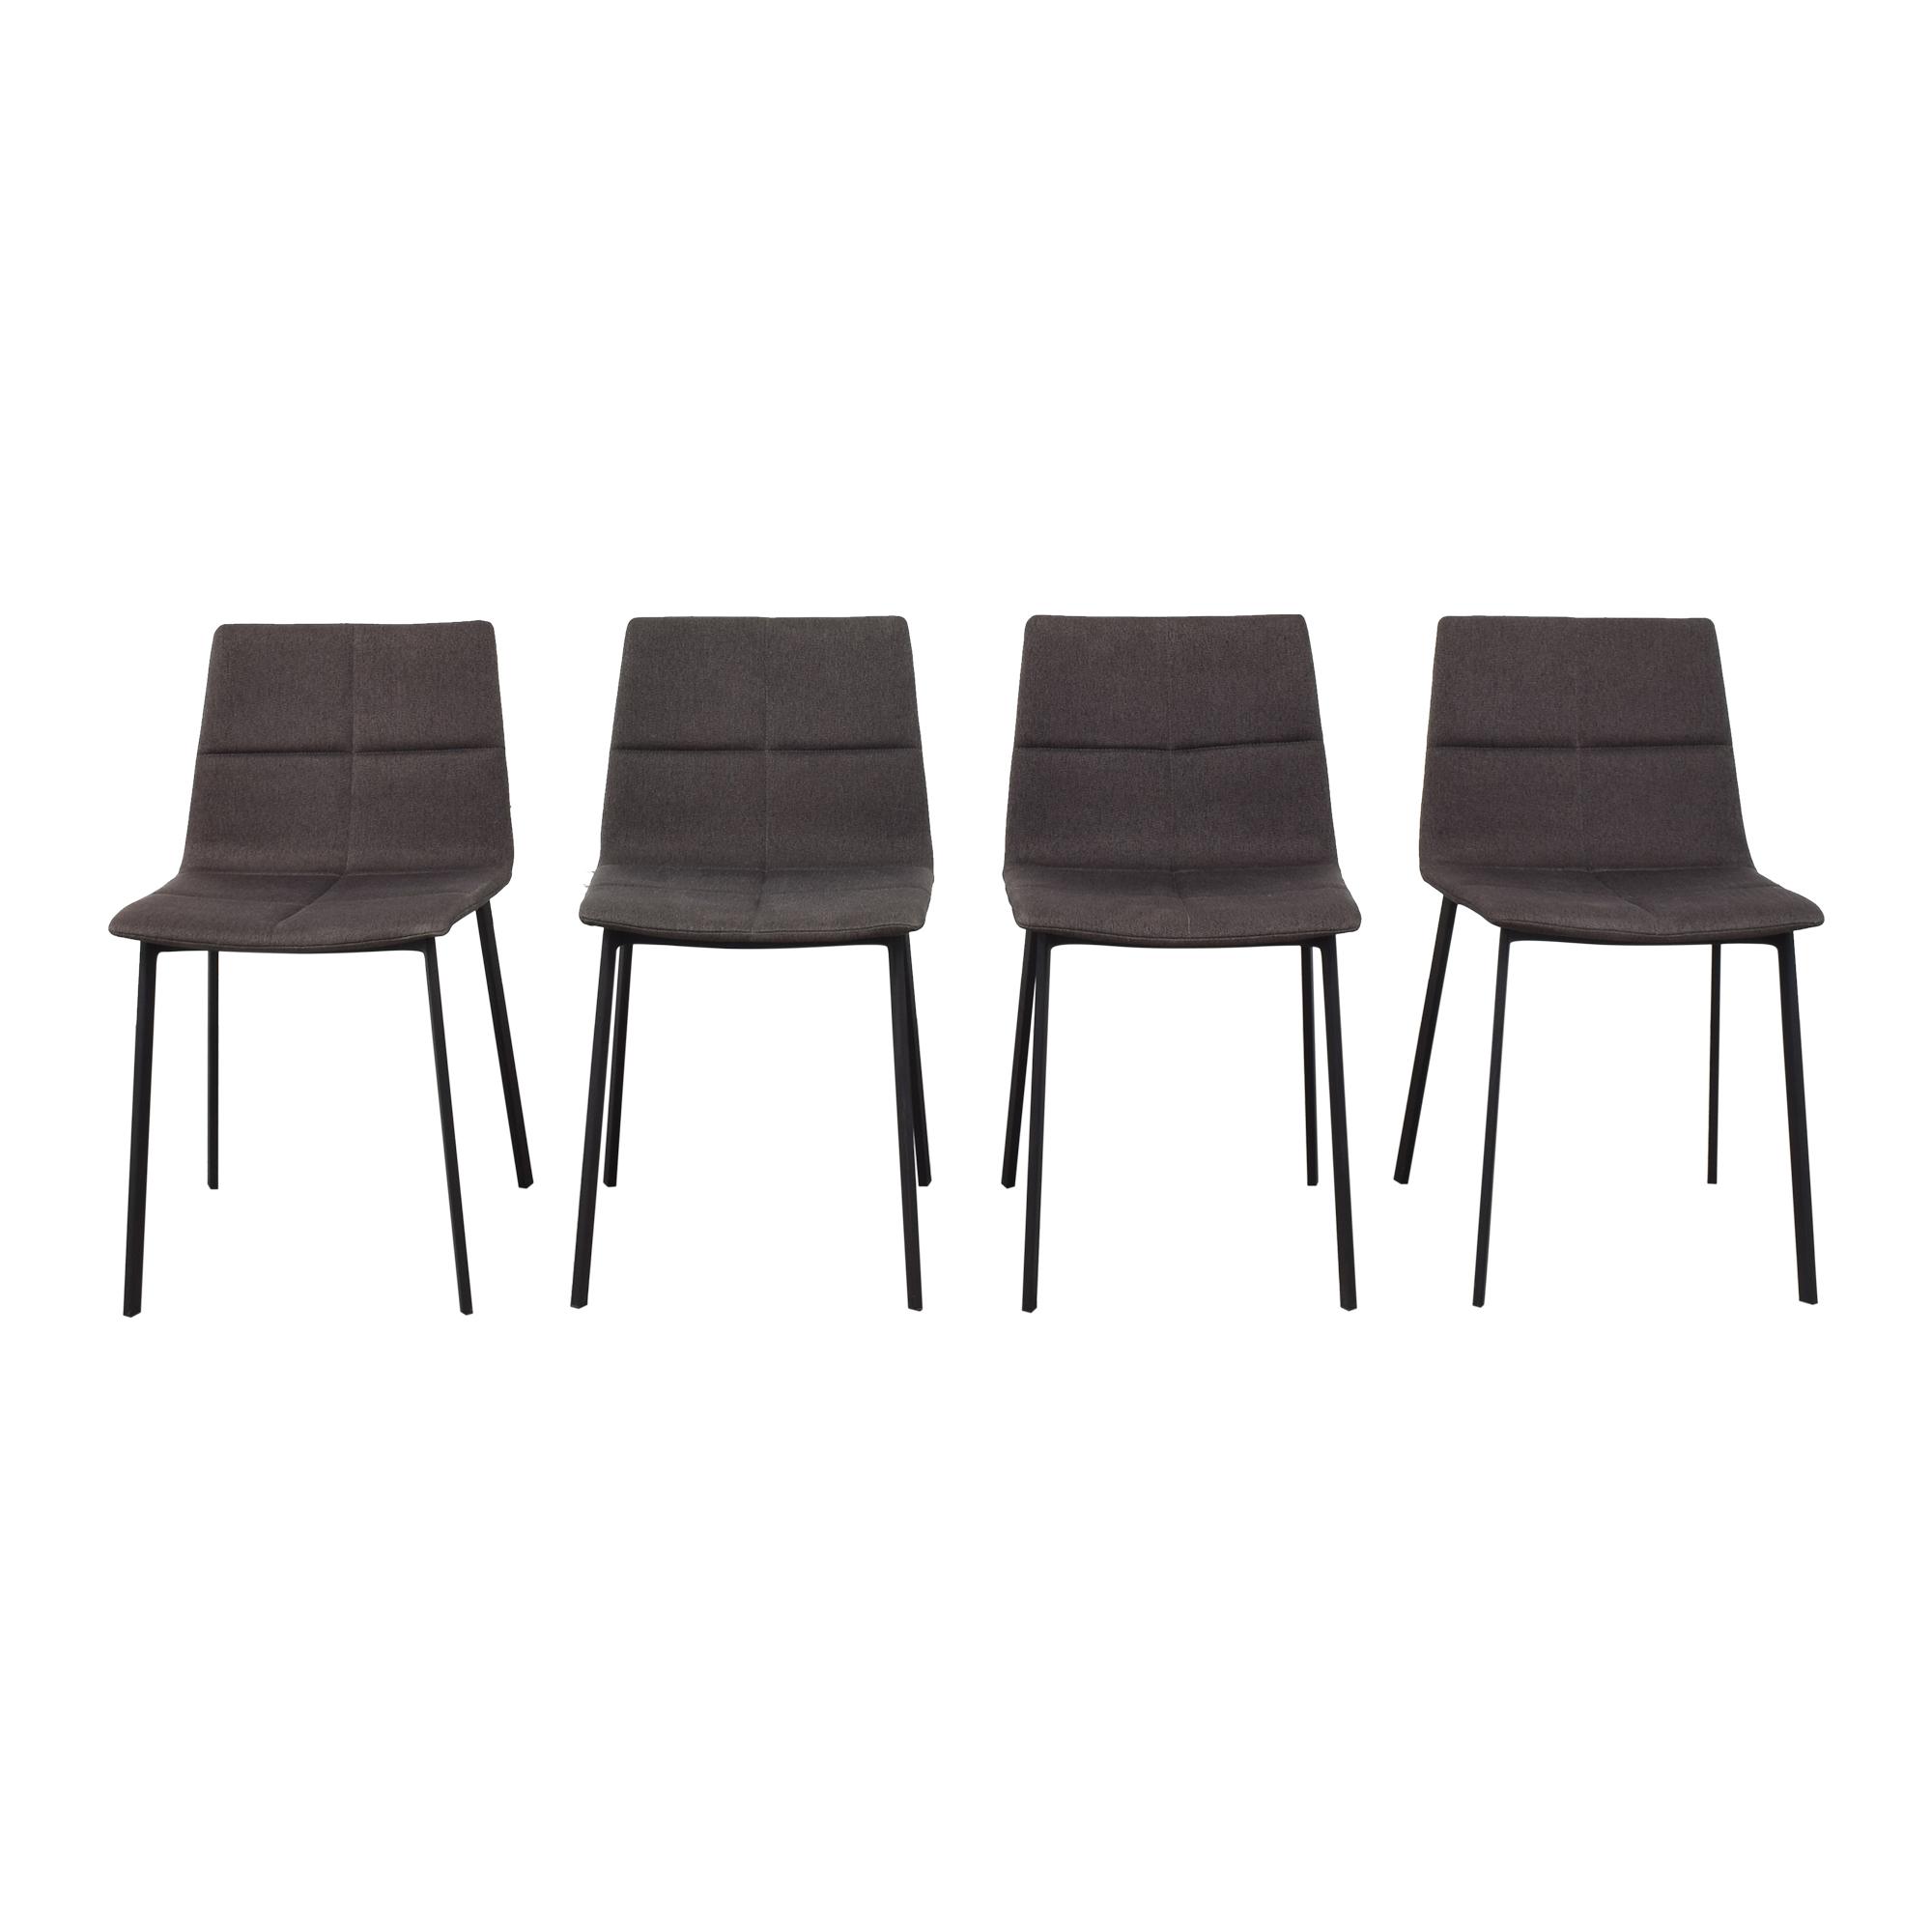 buy Blu Dot Between Us Dining Chairs Blu Dot Chairs